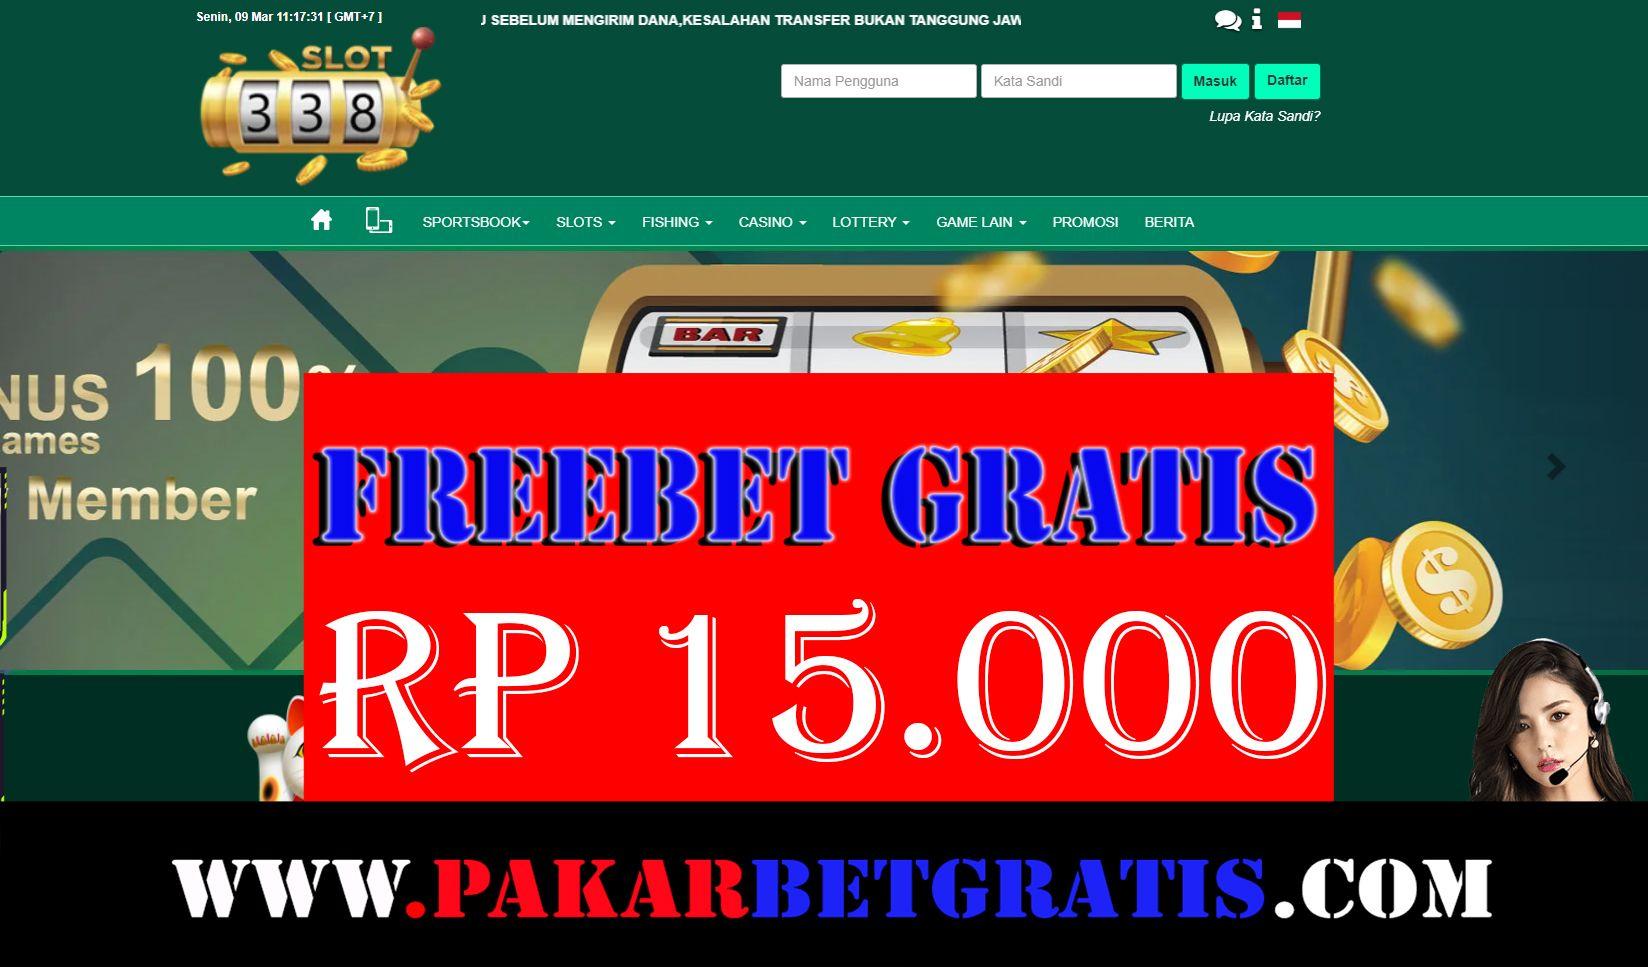 Freebet online 36960